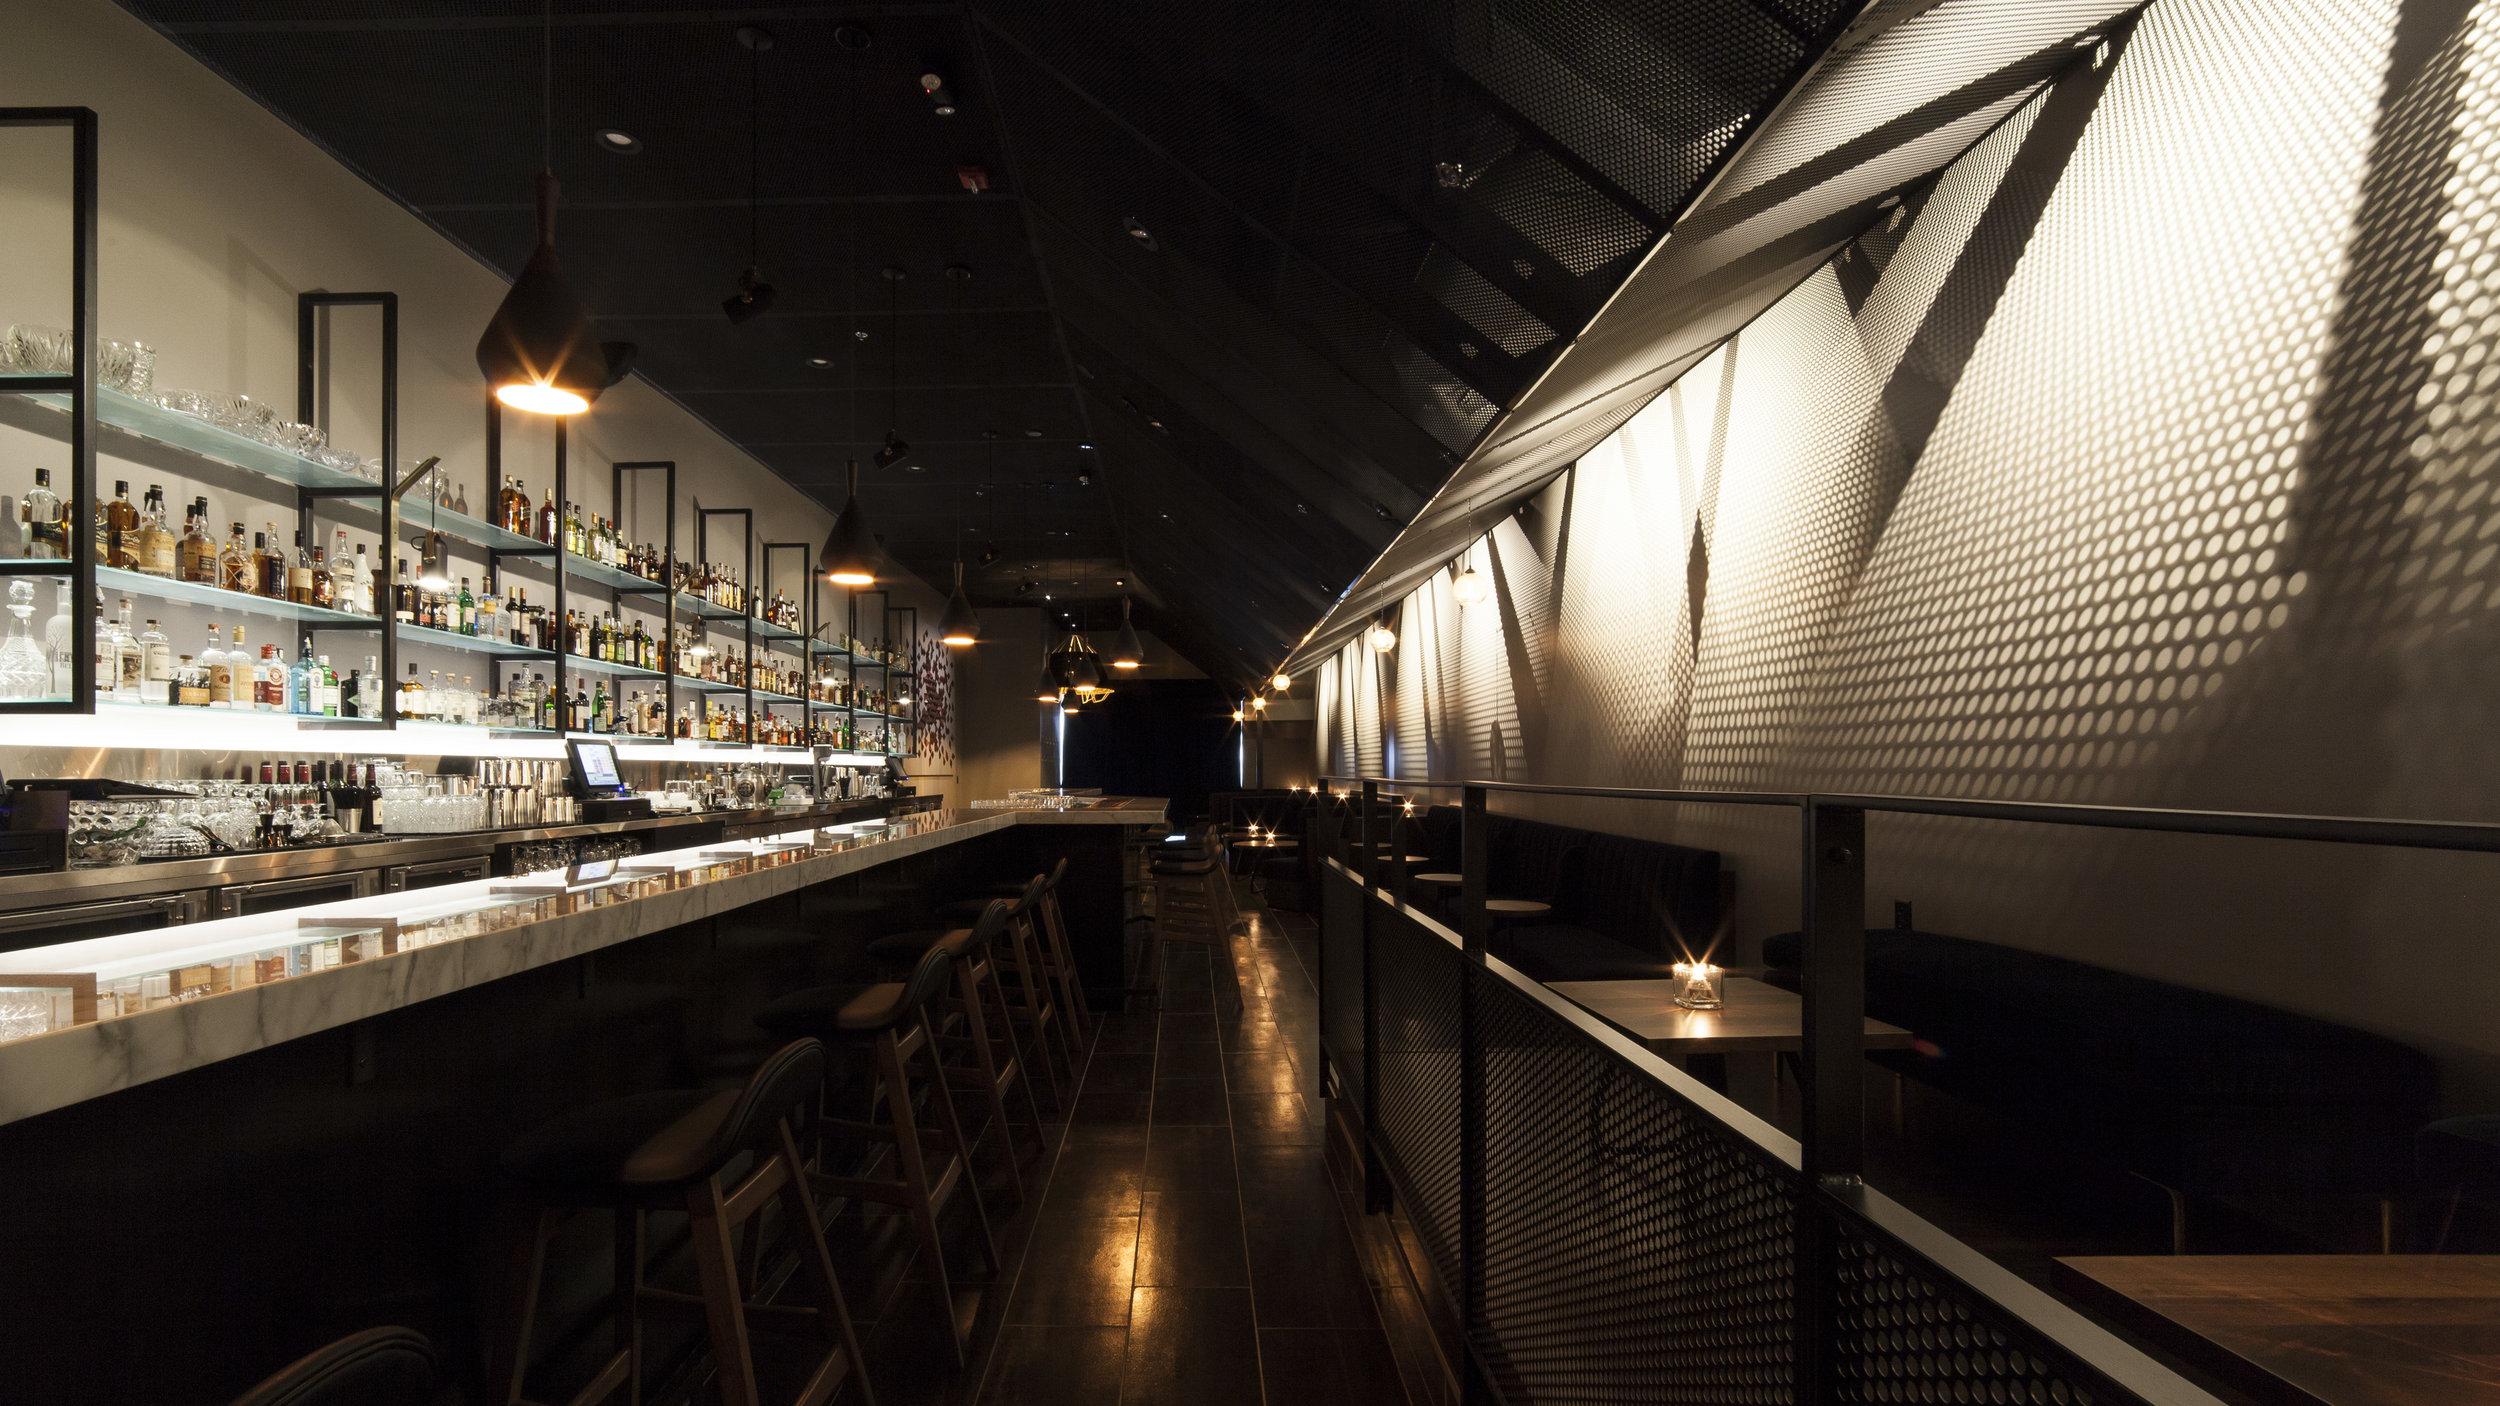 Nightcap Ann Arbor bar interior design by Synecdoche Design Studio